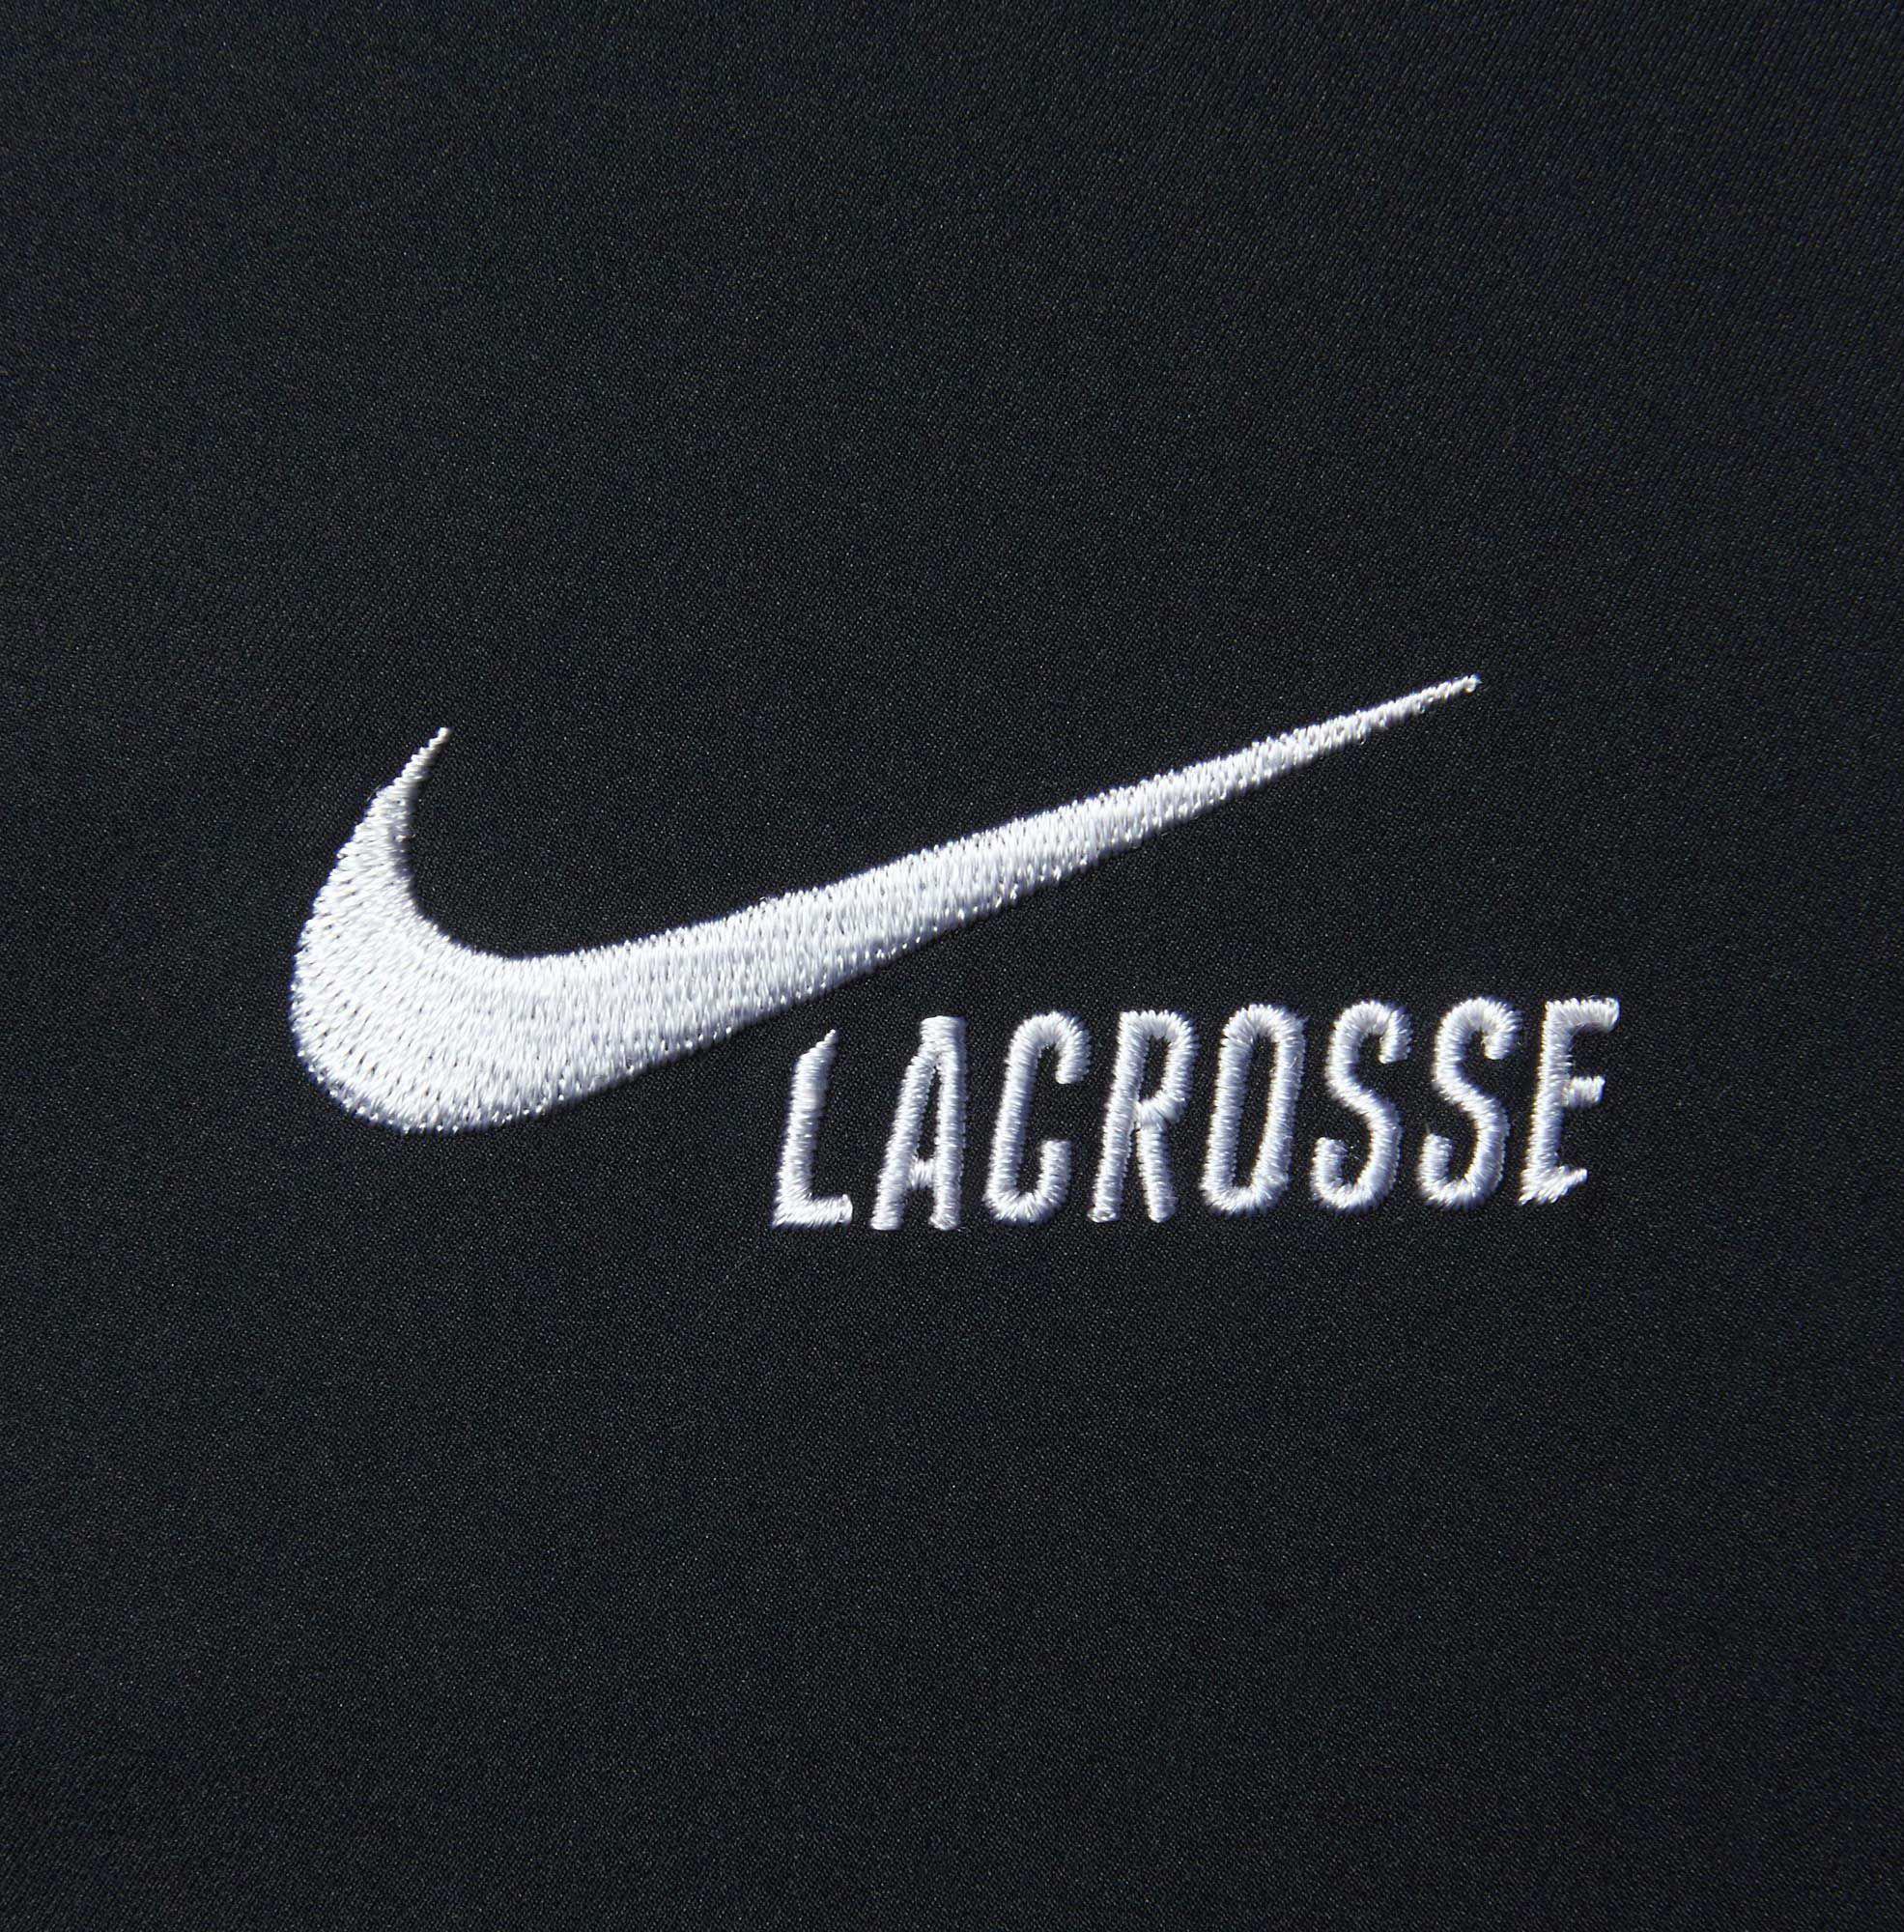 Nike Black Dry Fast Break Lacrosse Pants for men